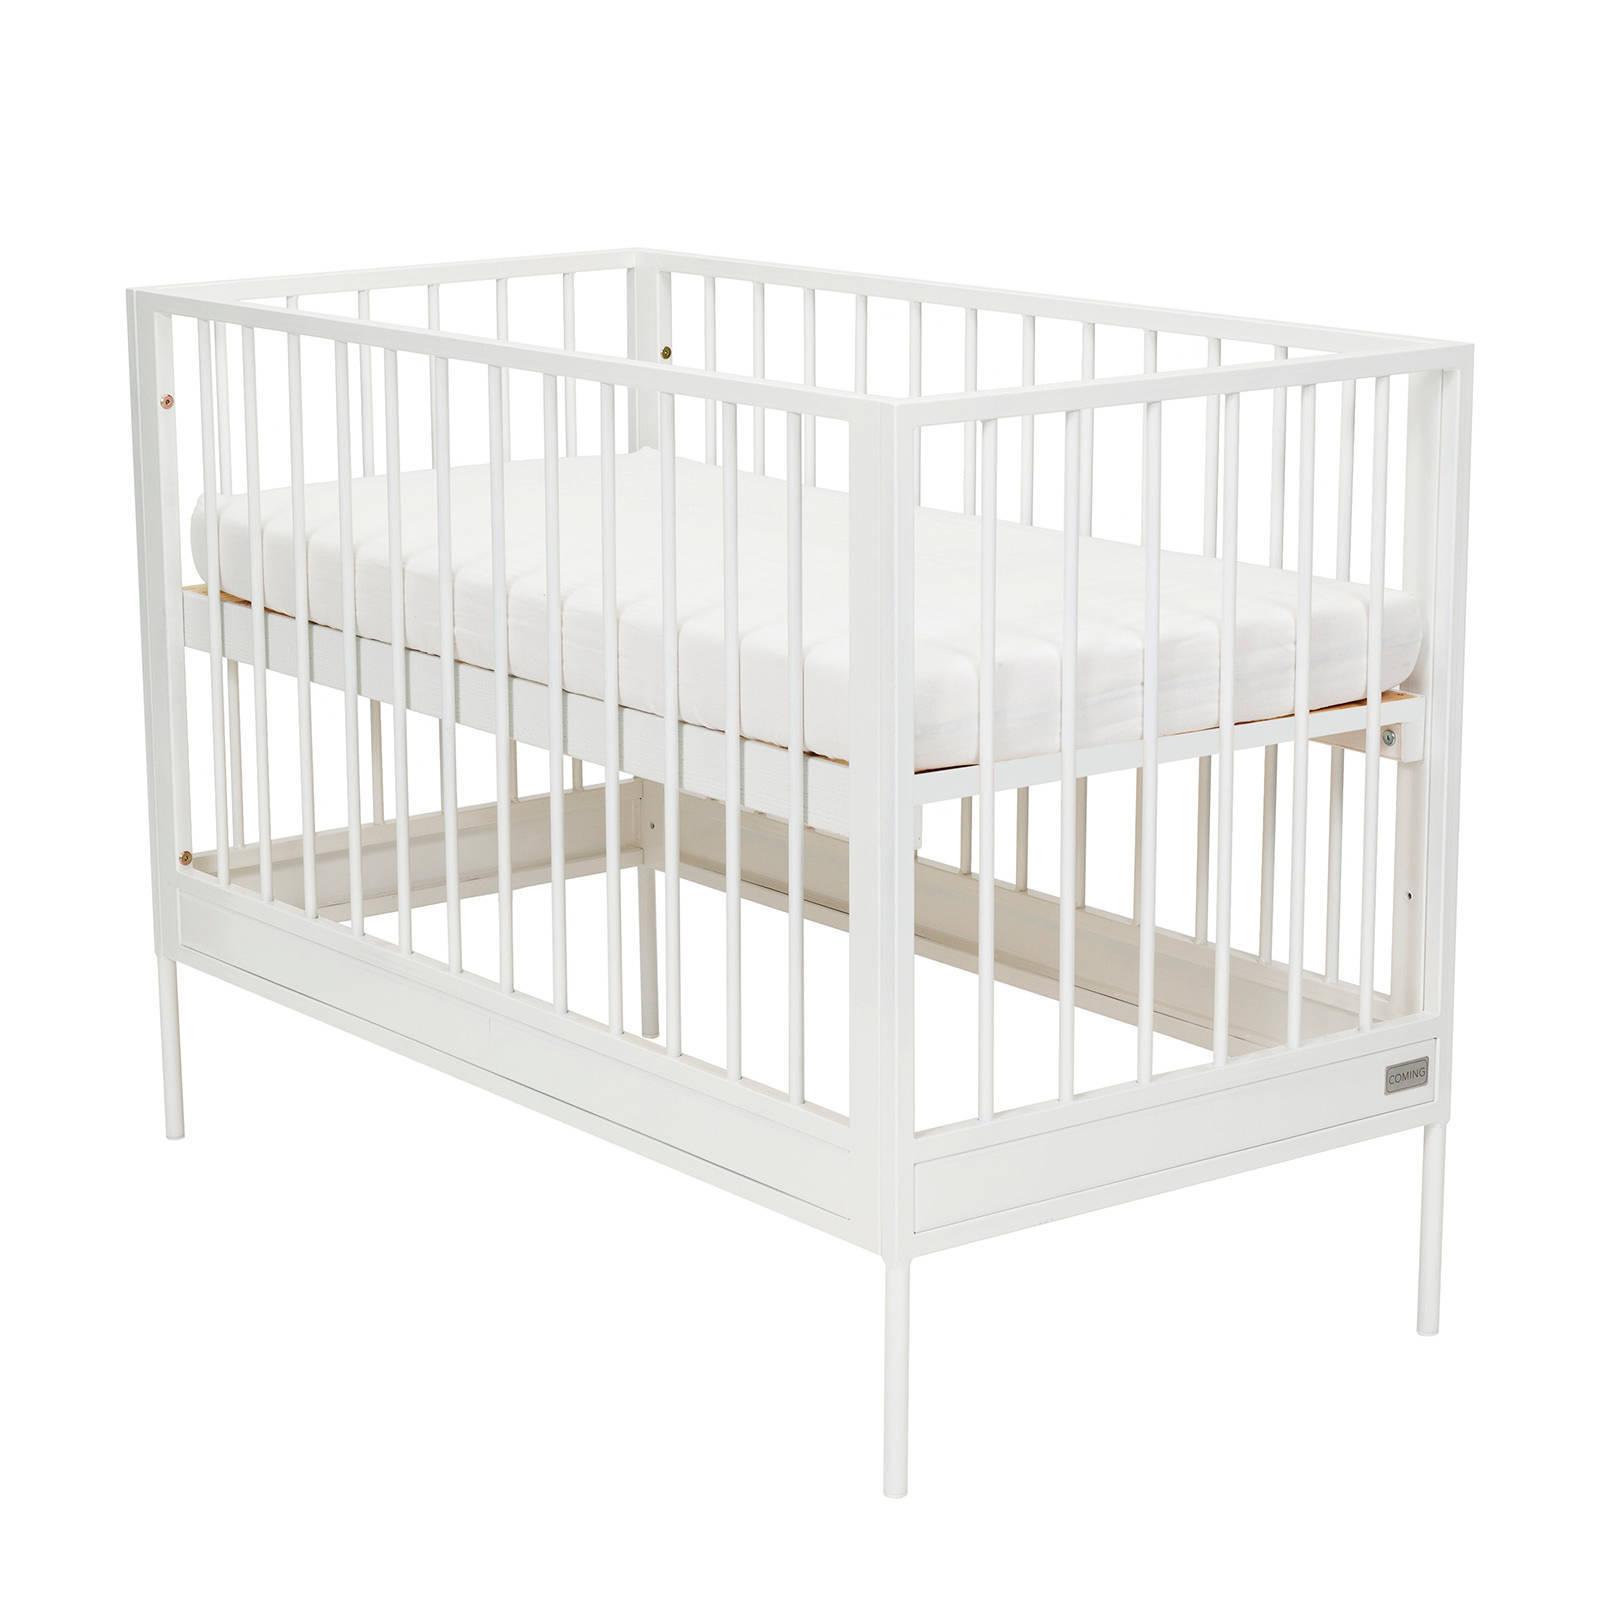 Ledikant Afmetingen Baby.Ledikanten Bij Wehkamp Gratis Bezorging Vanaf 20